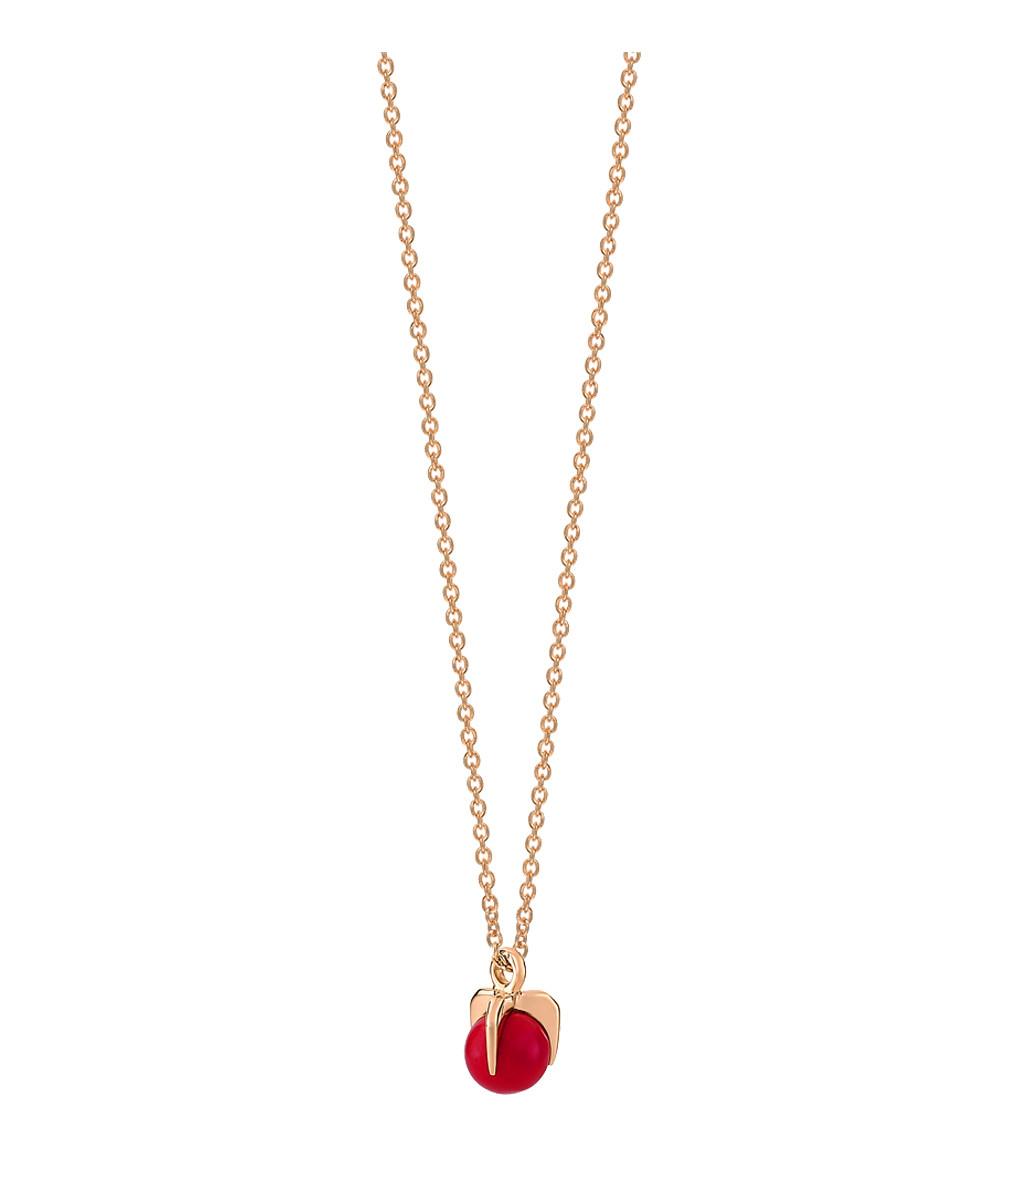 GINETTE_NY - Collier Maria Mini Or Rose Corail